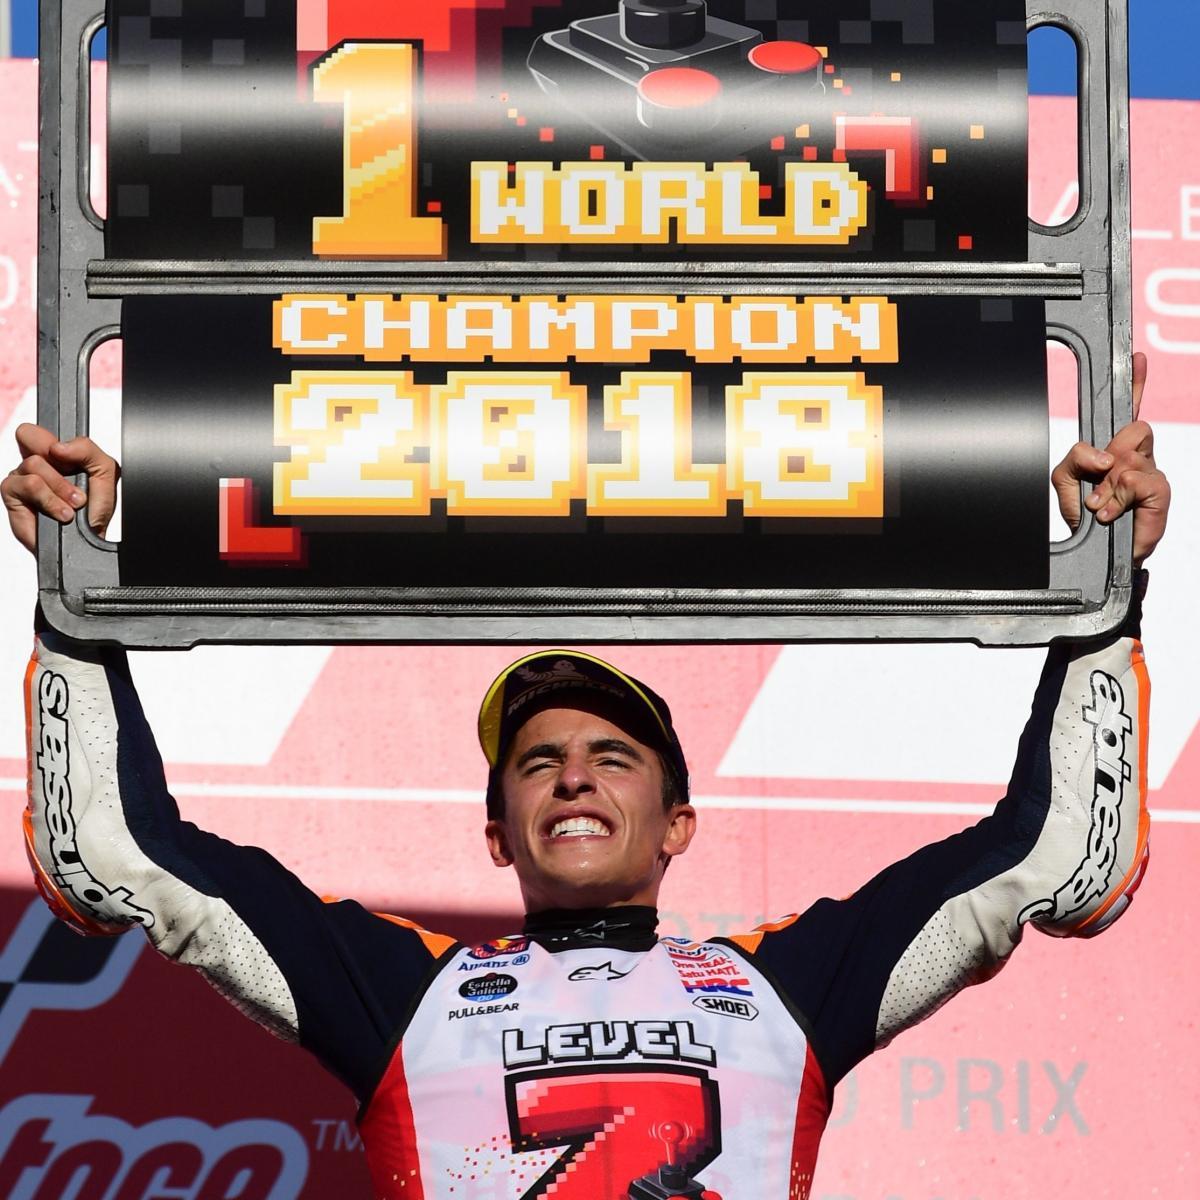 Marc Marquez Crowned 2018 MotoGP World Champion After Japan Grand Prix Win